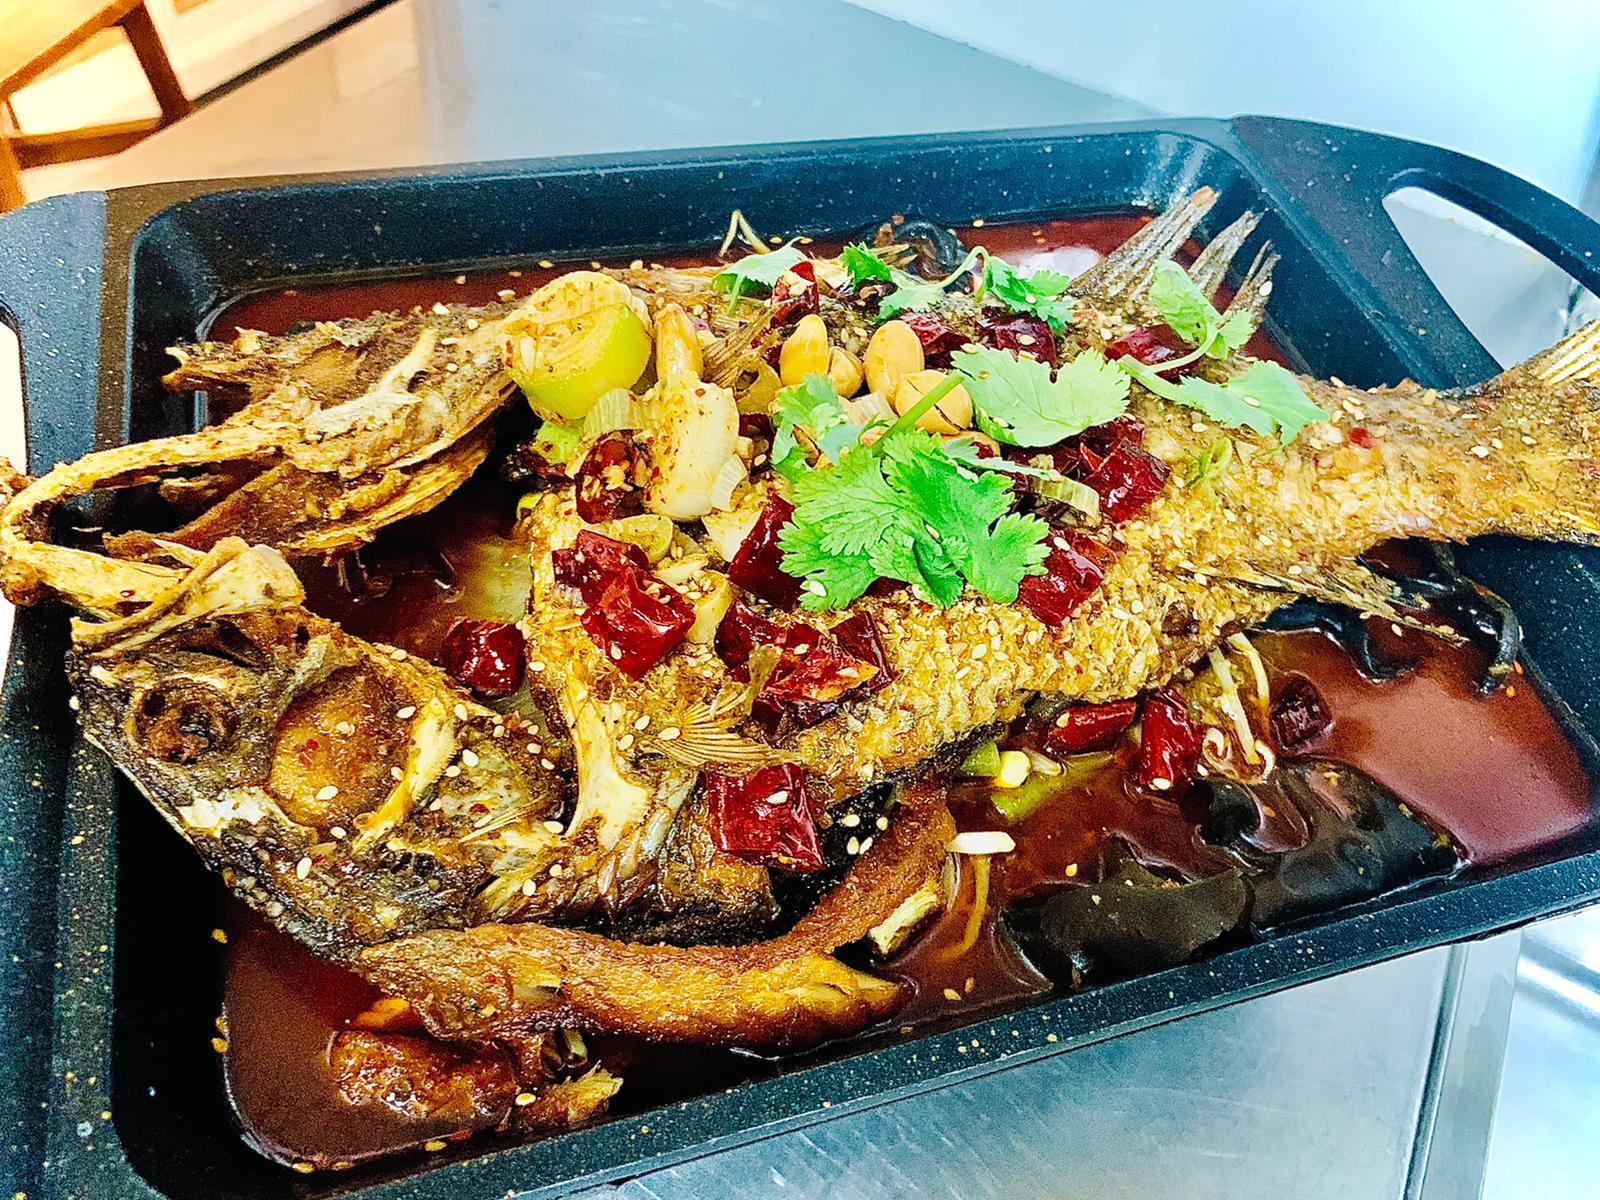 Ju Bao Xuan Mala Hotpot - super spicy grilled fish